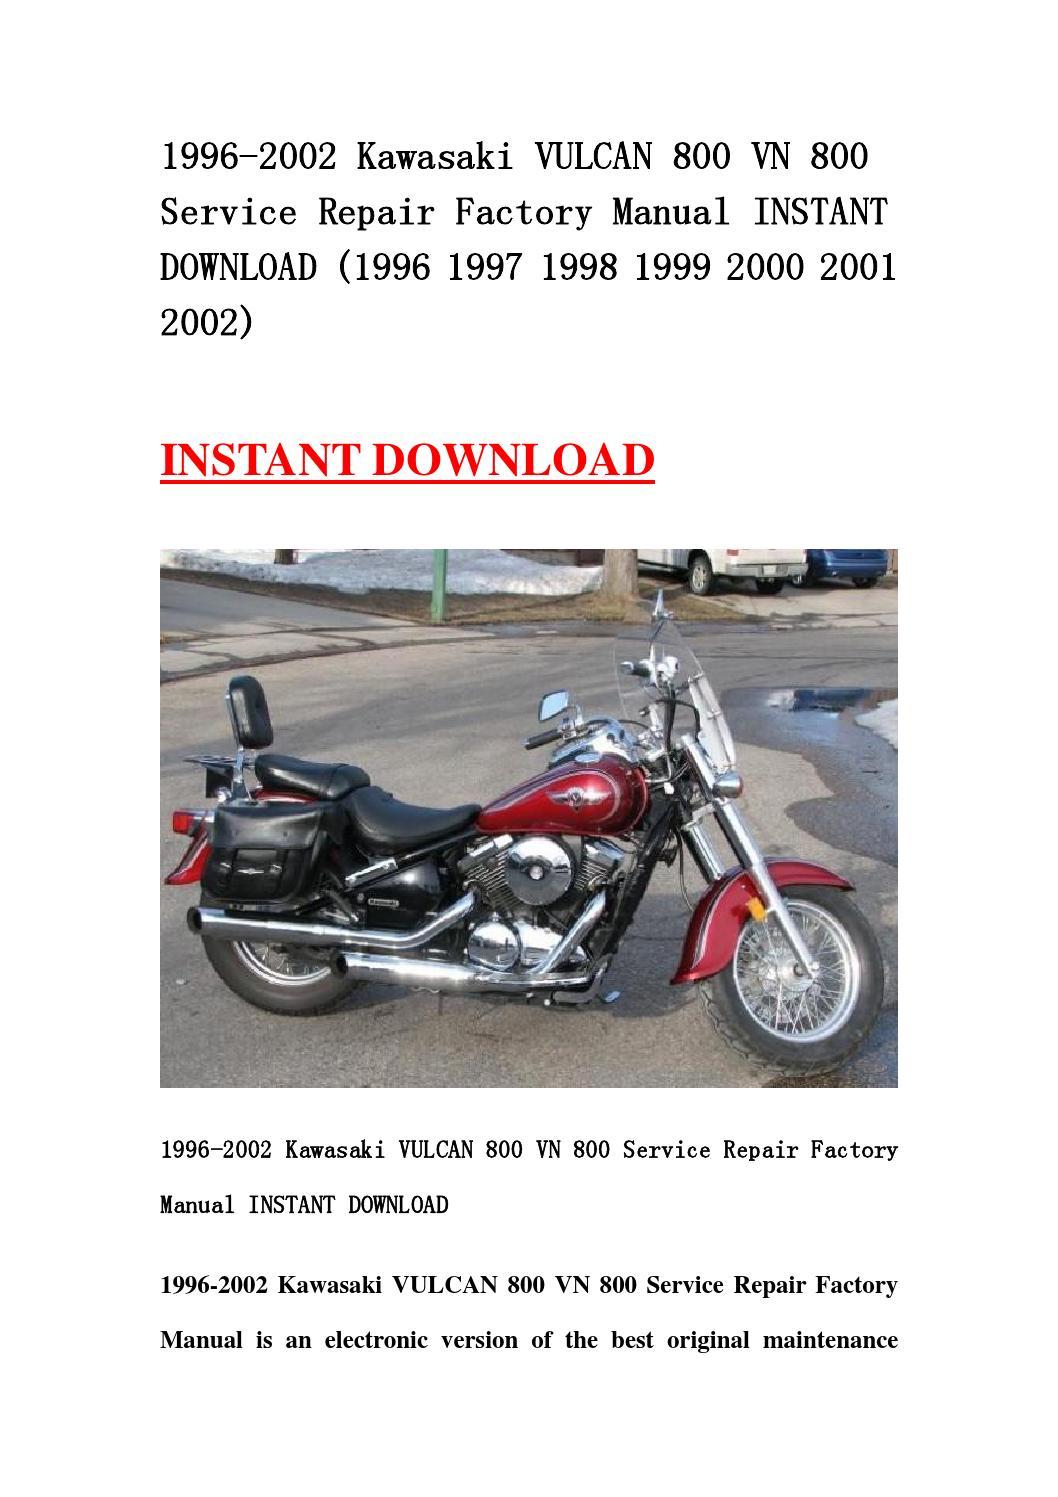 2005 kawasaki vulcan 800 service manual